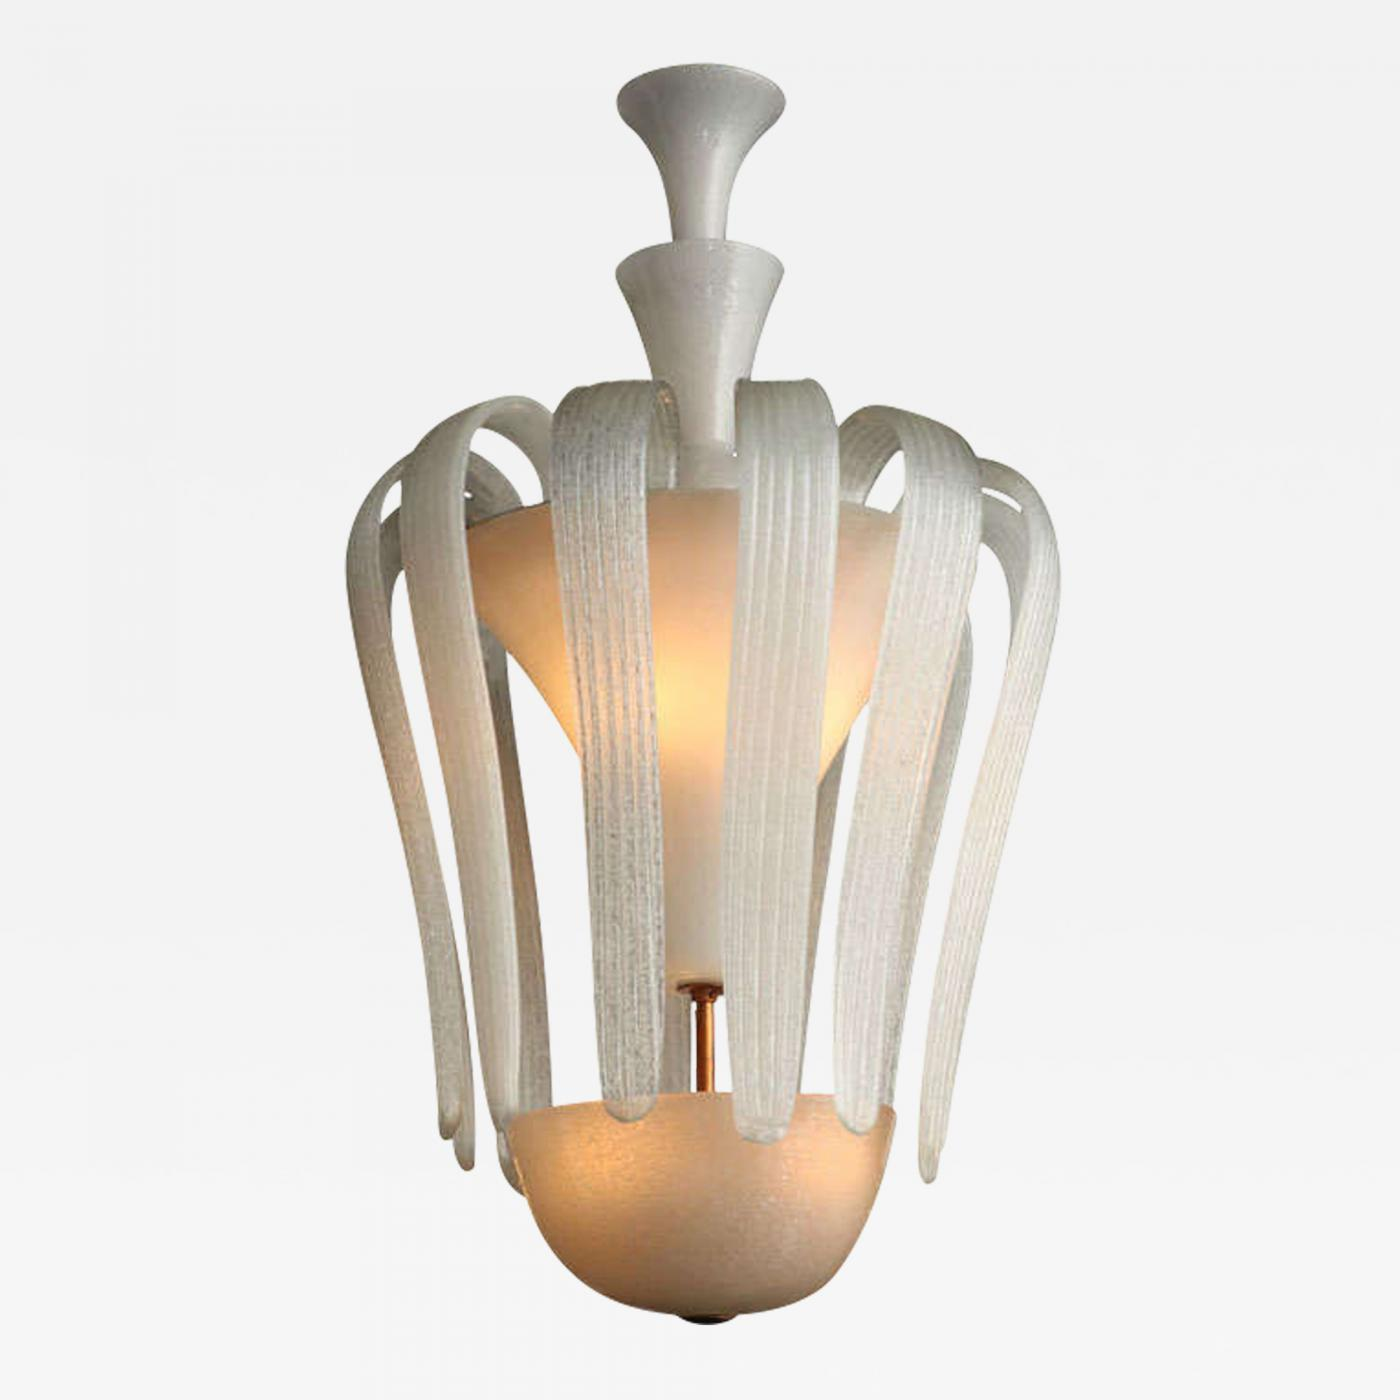 Venini venini chandelier made in venice in 1931 listings furniture lighting chandeliers and pendants arubaitofo Gallery